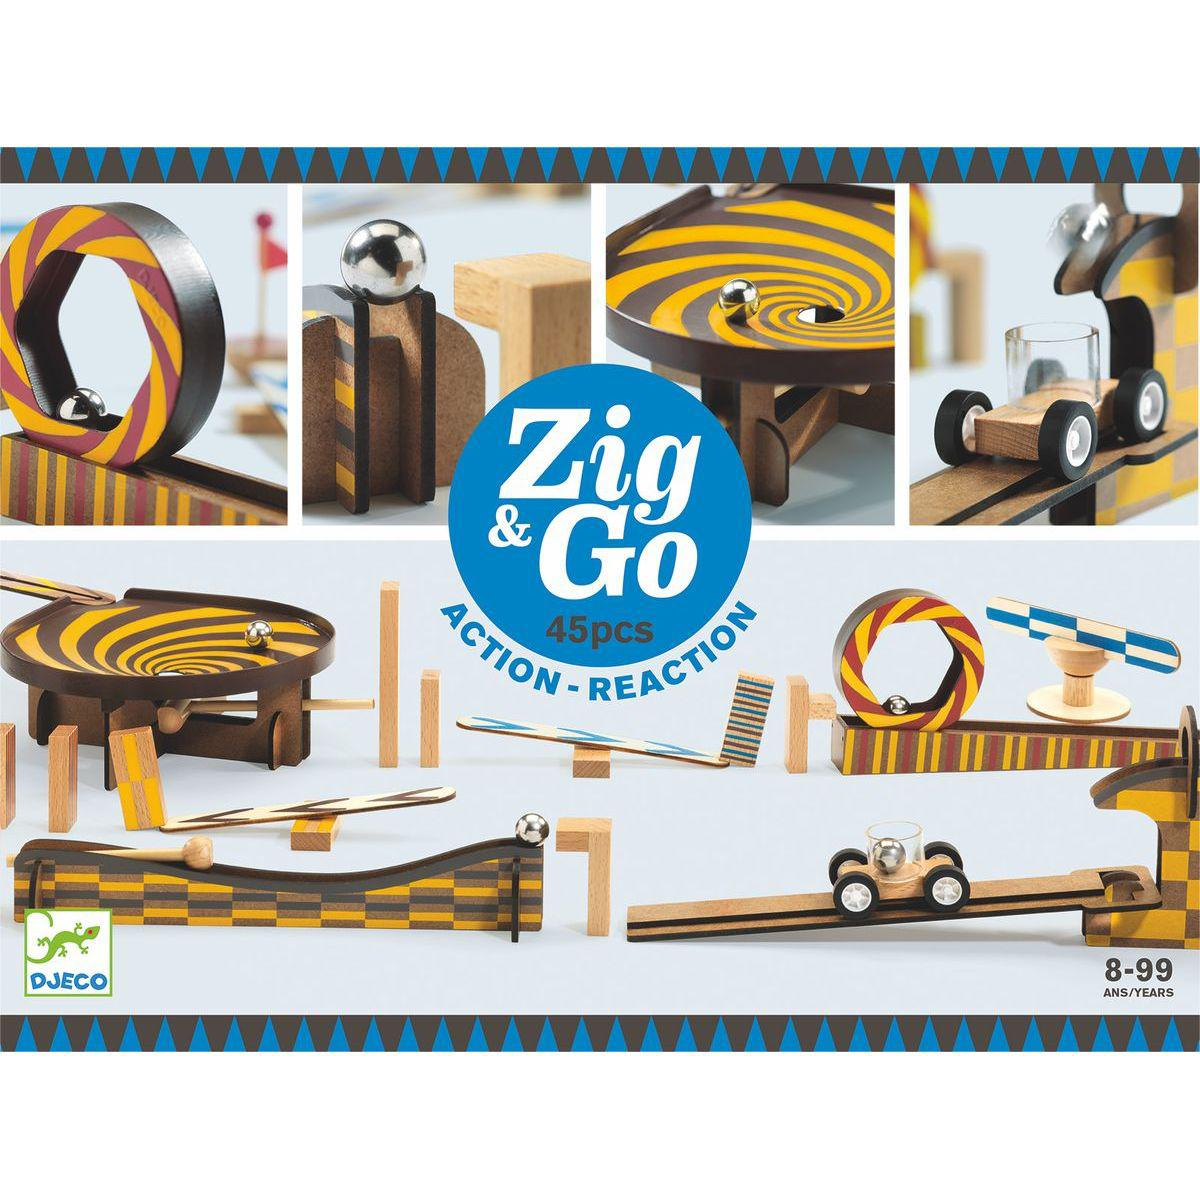 Parcours de domino 45pces ZIG & GO Djeco